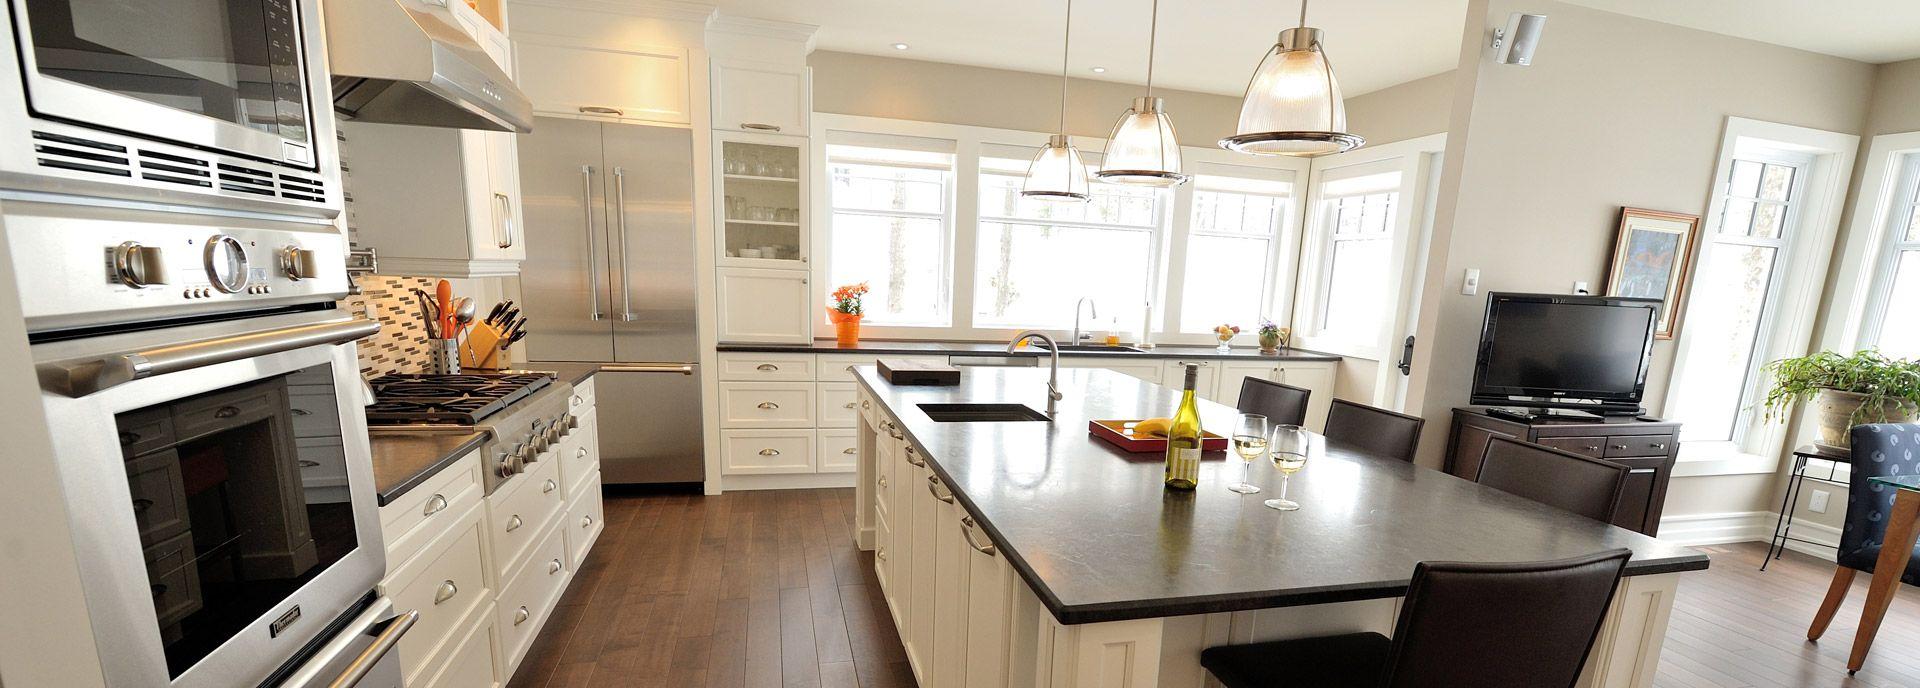 La Bistro: Cuisine avec comptoir de granit | Ateliers Jacob | Dream ...